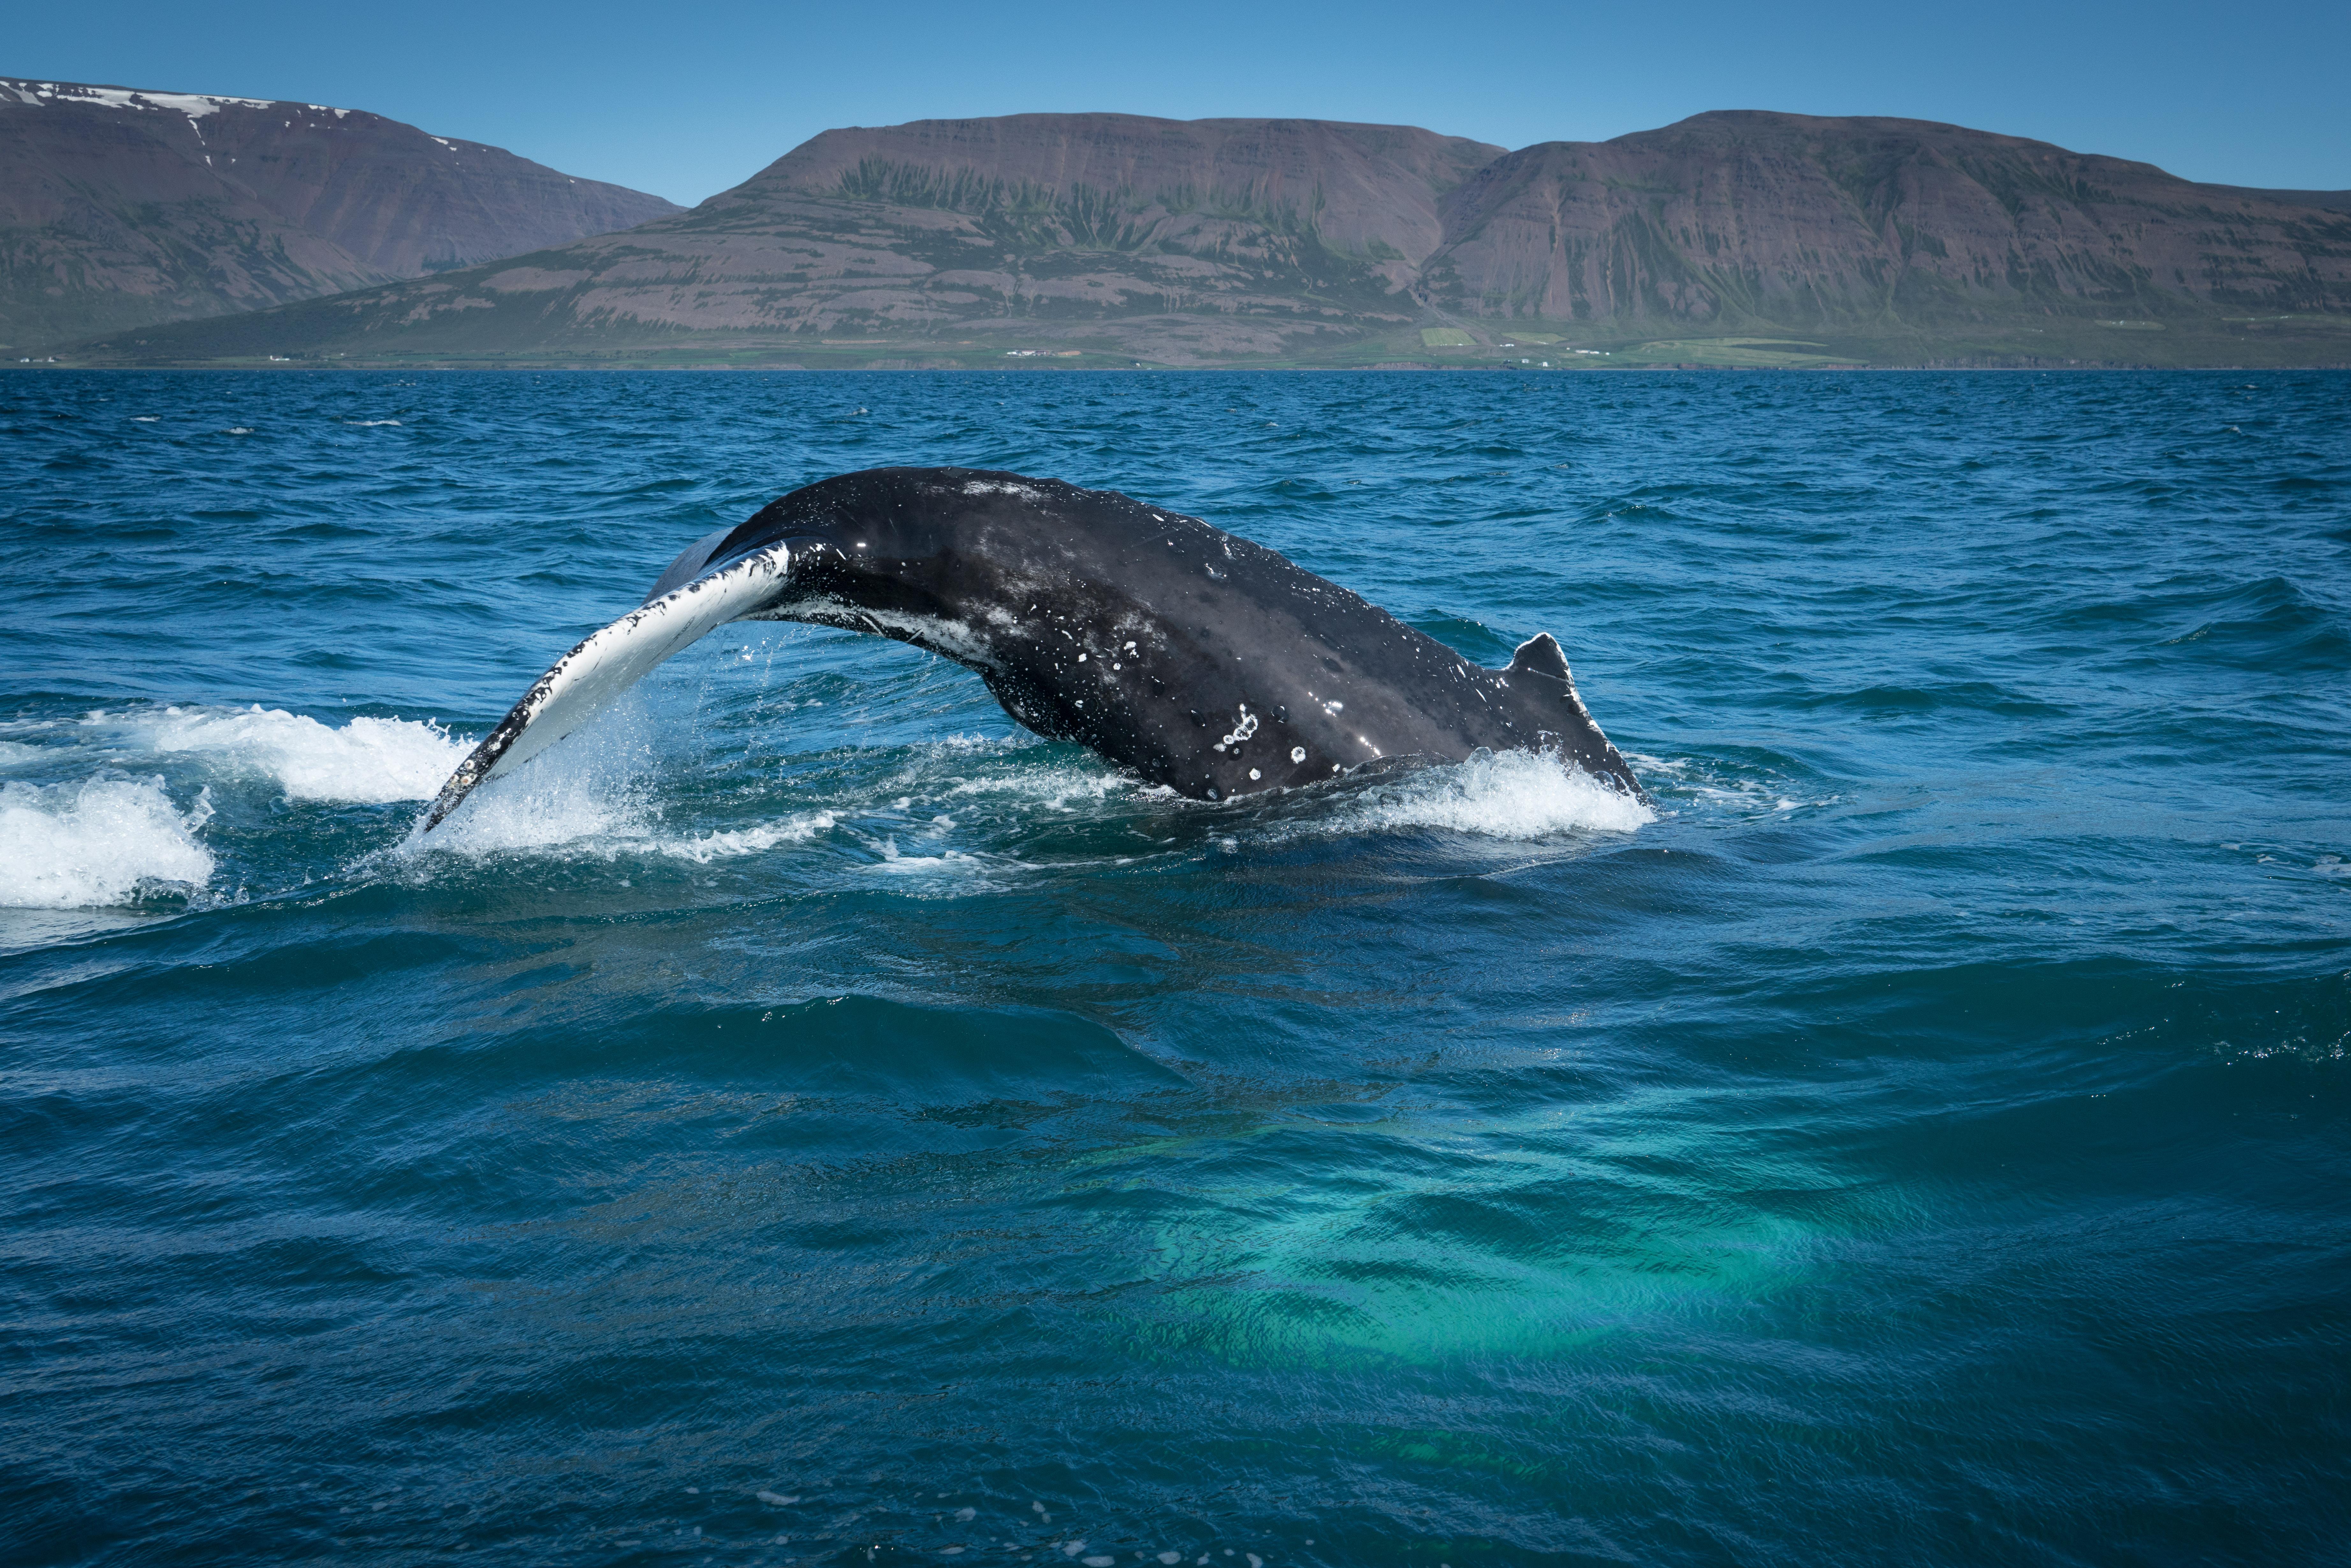 #whale, #humpback, #jackson, #fjord, #iceland, #rib, #akureyri, #wildlife, #windstar